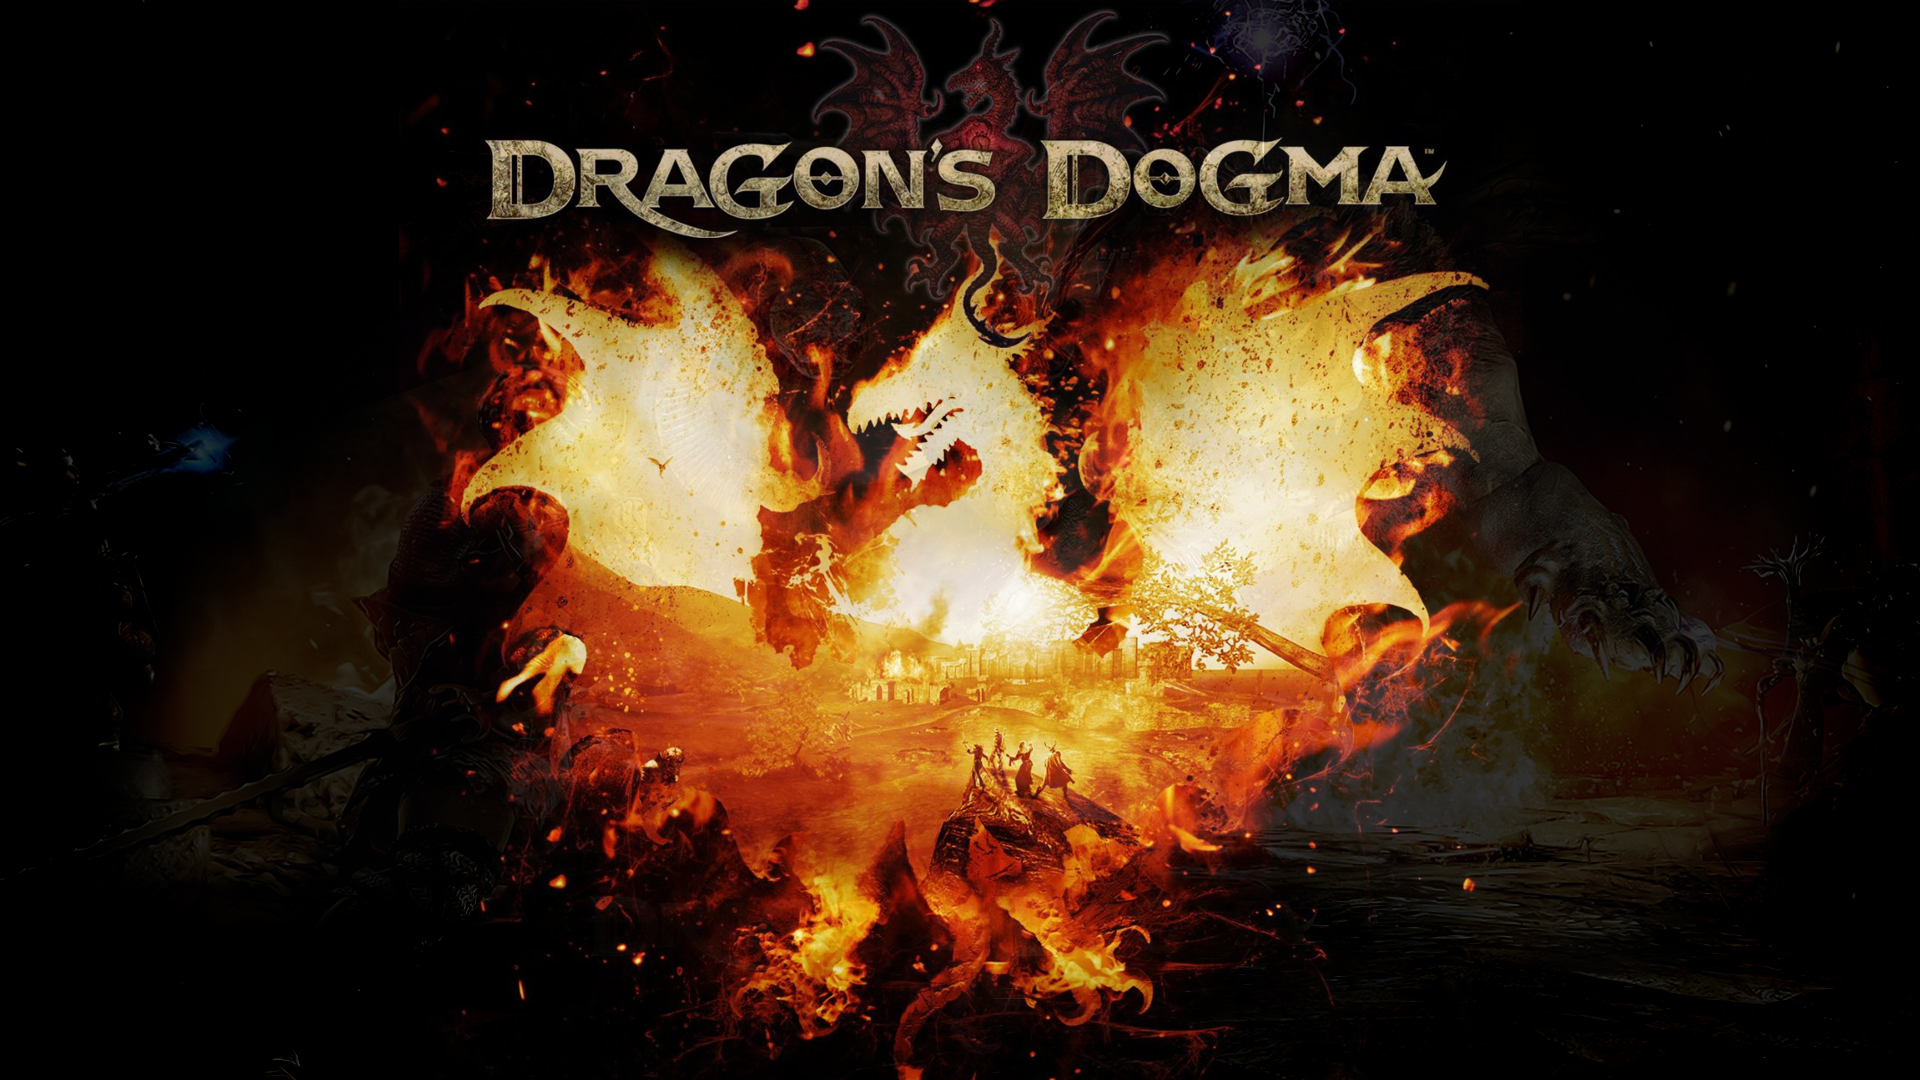 dragon__s_dogma_wallpaper_by_slydog0905-d51w21f.png